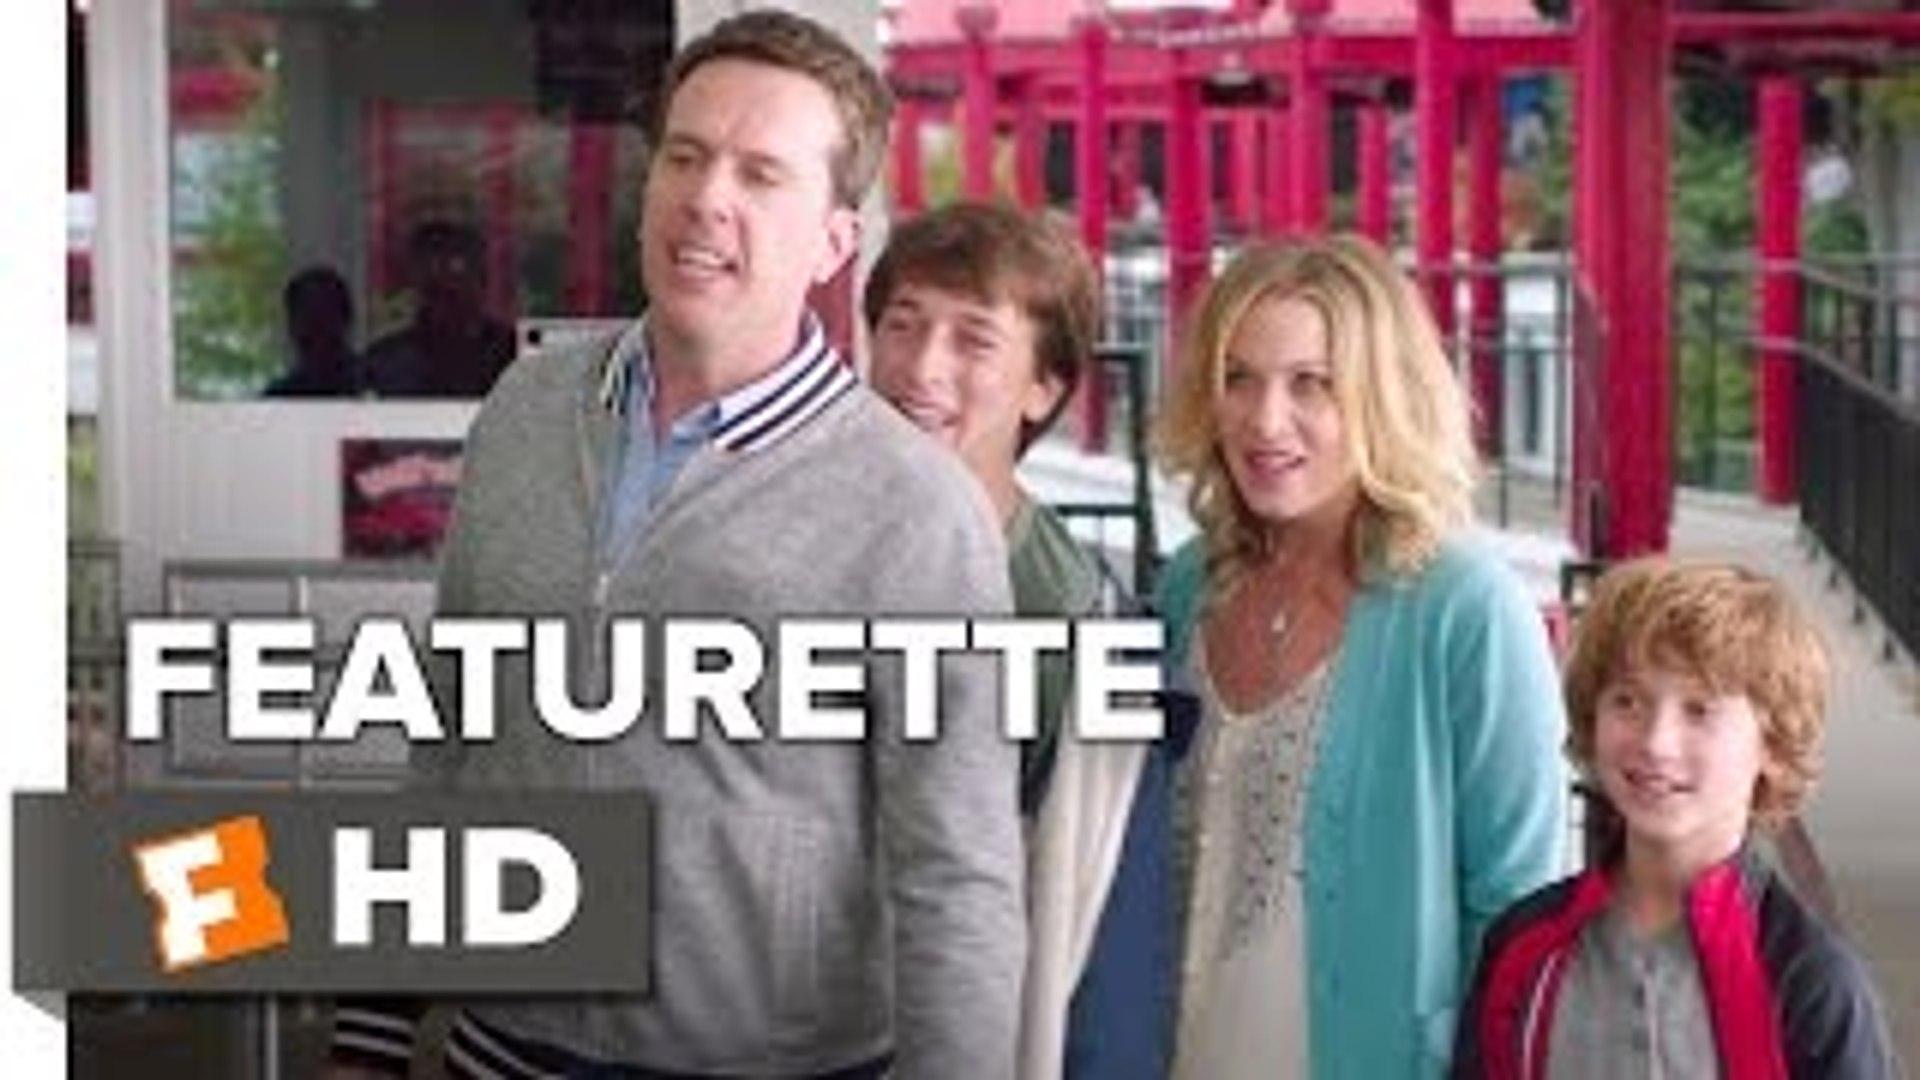 Vacation Featurette - Meet the Griswolds (2015) - Ed Helms, Leslie Mann Comedy H_HD